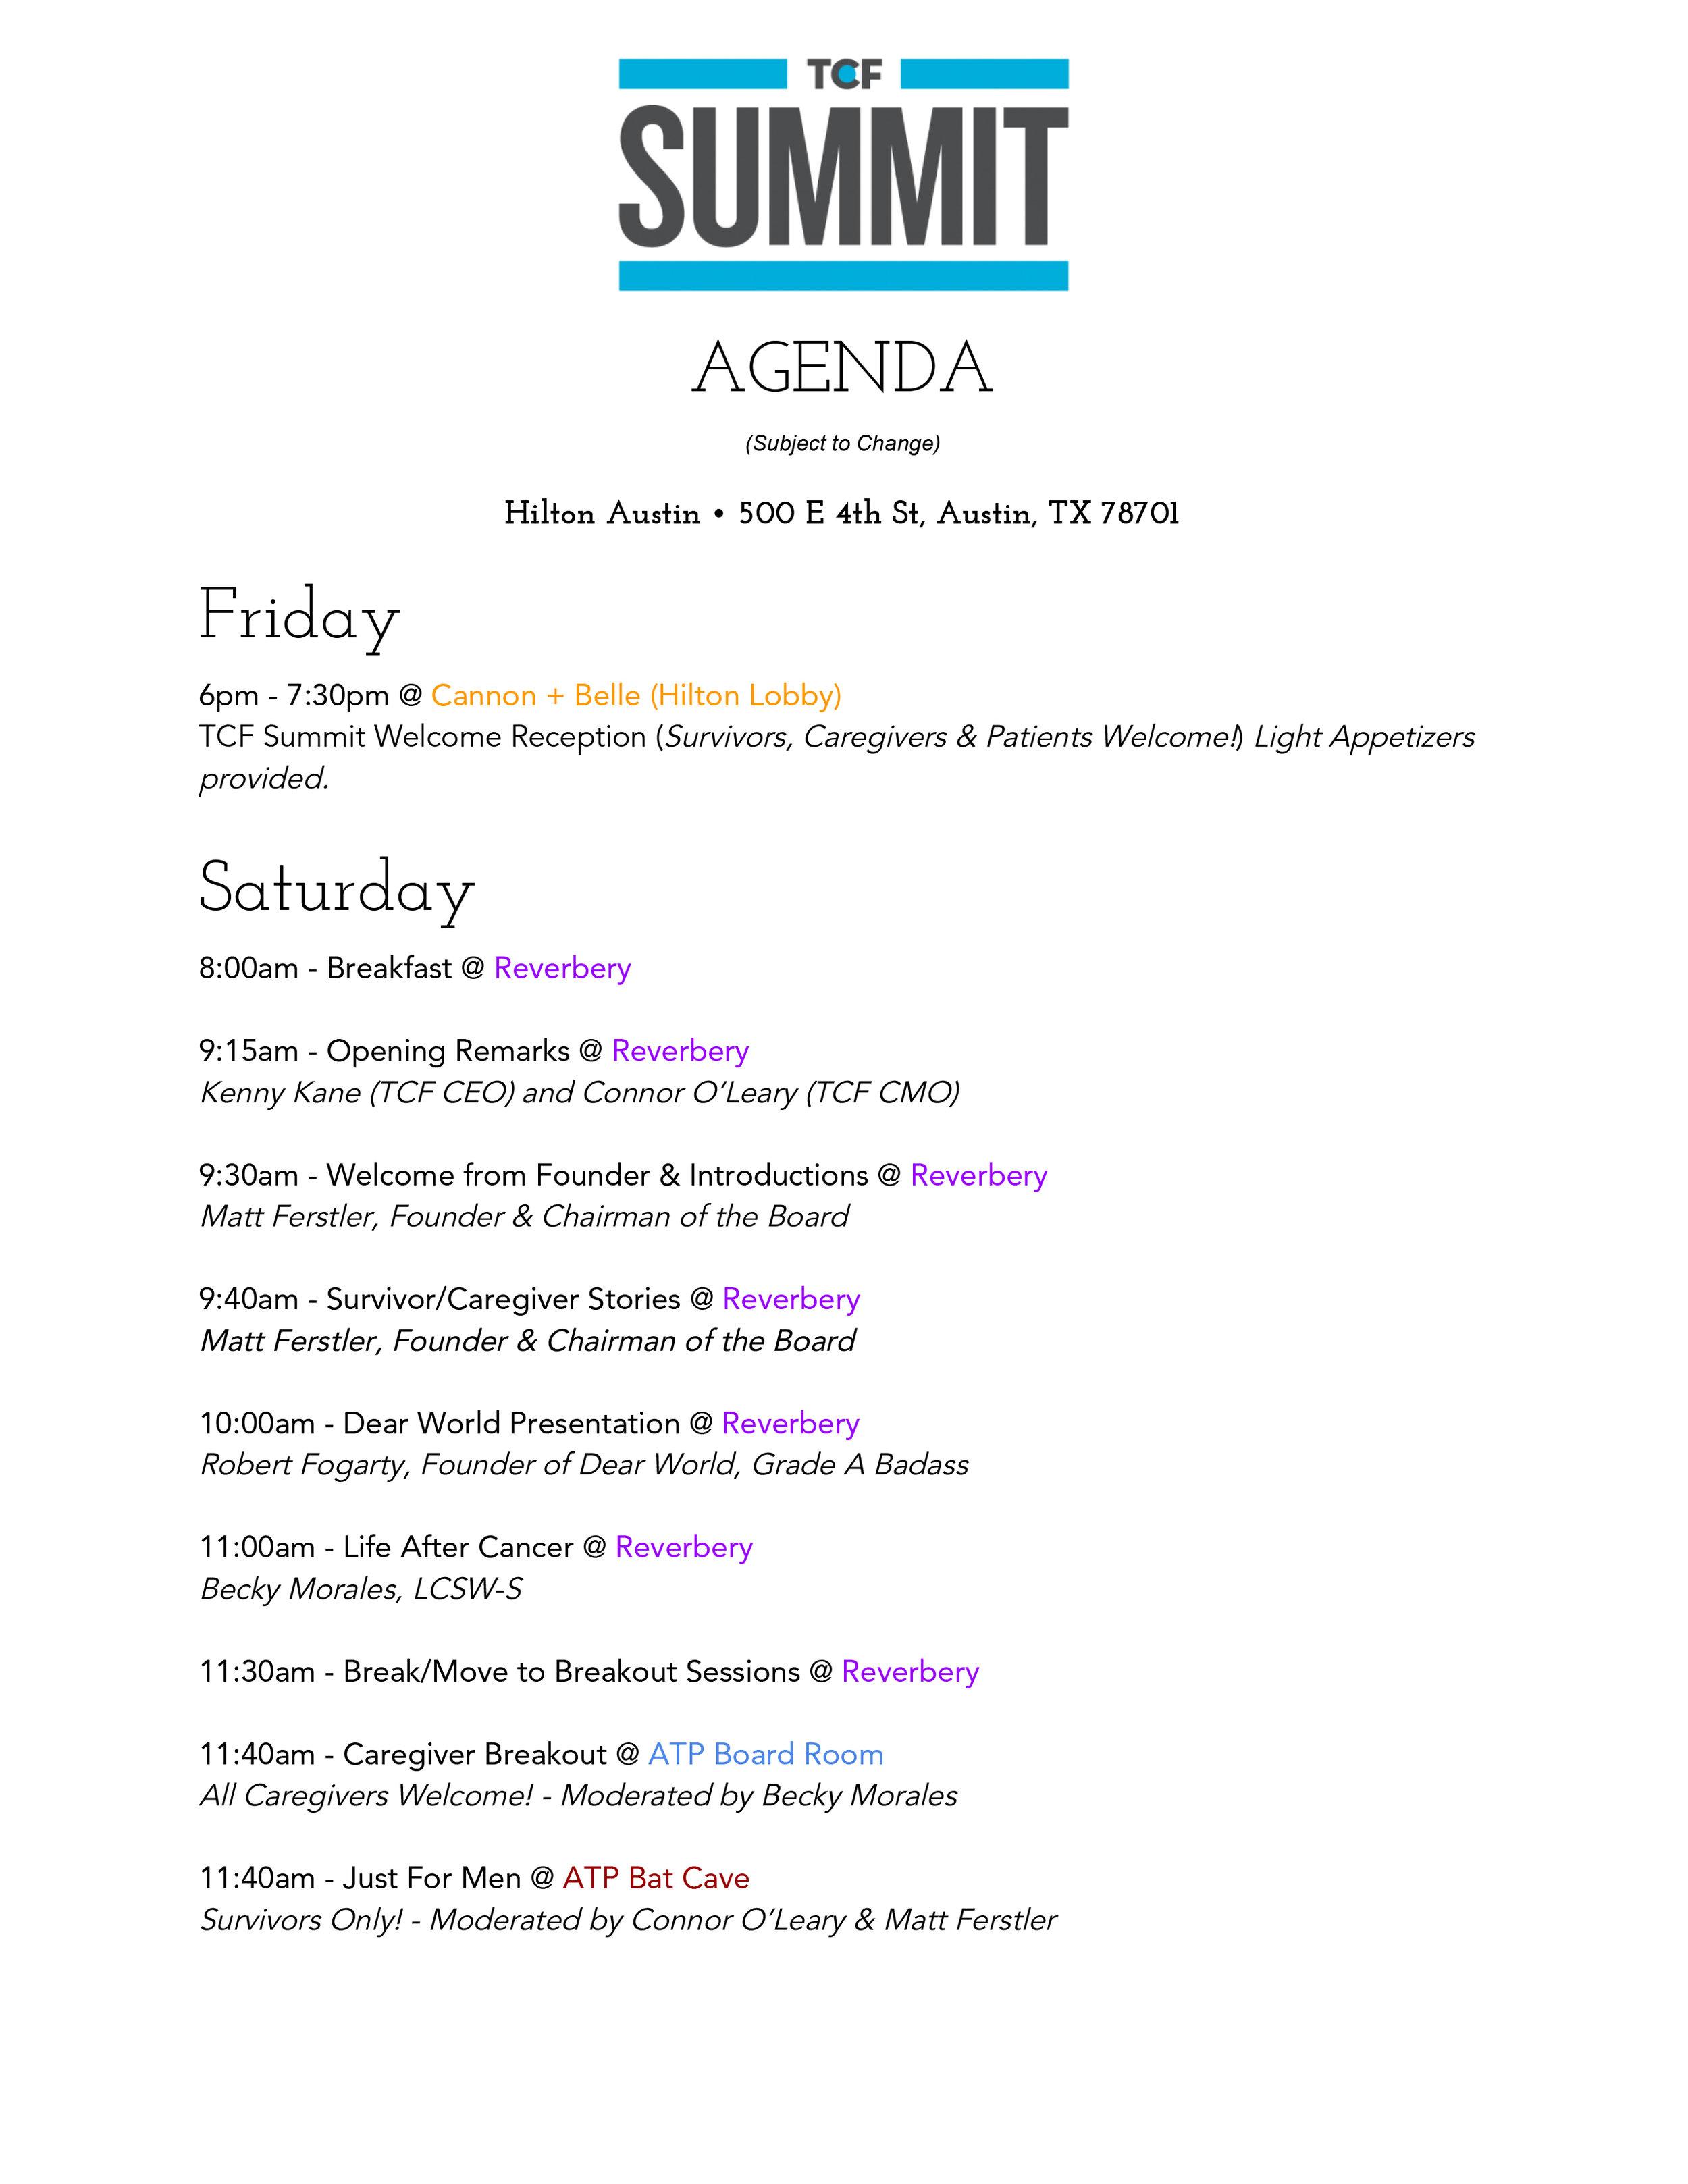 TCF Summit Agenda 2019.jpg